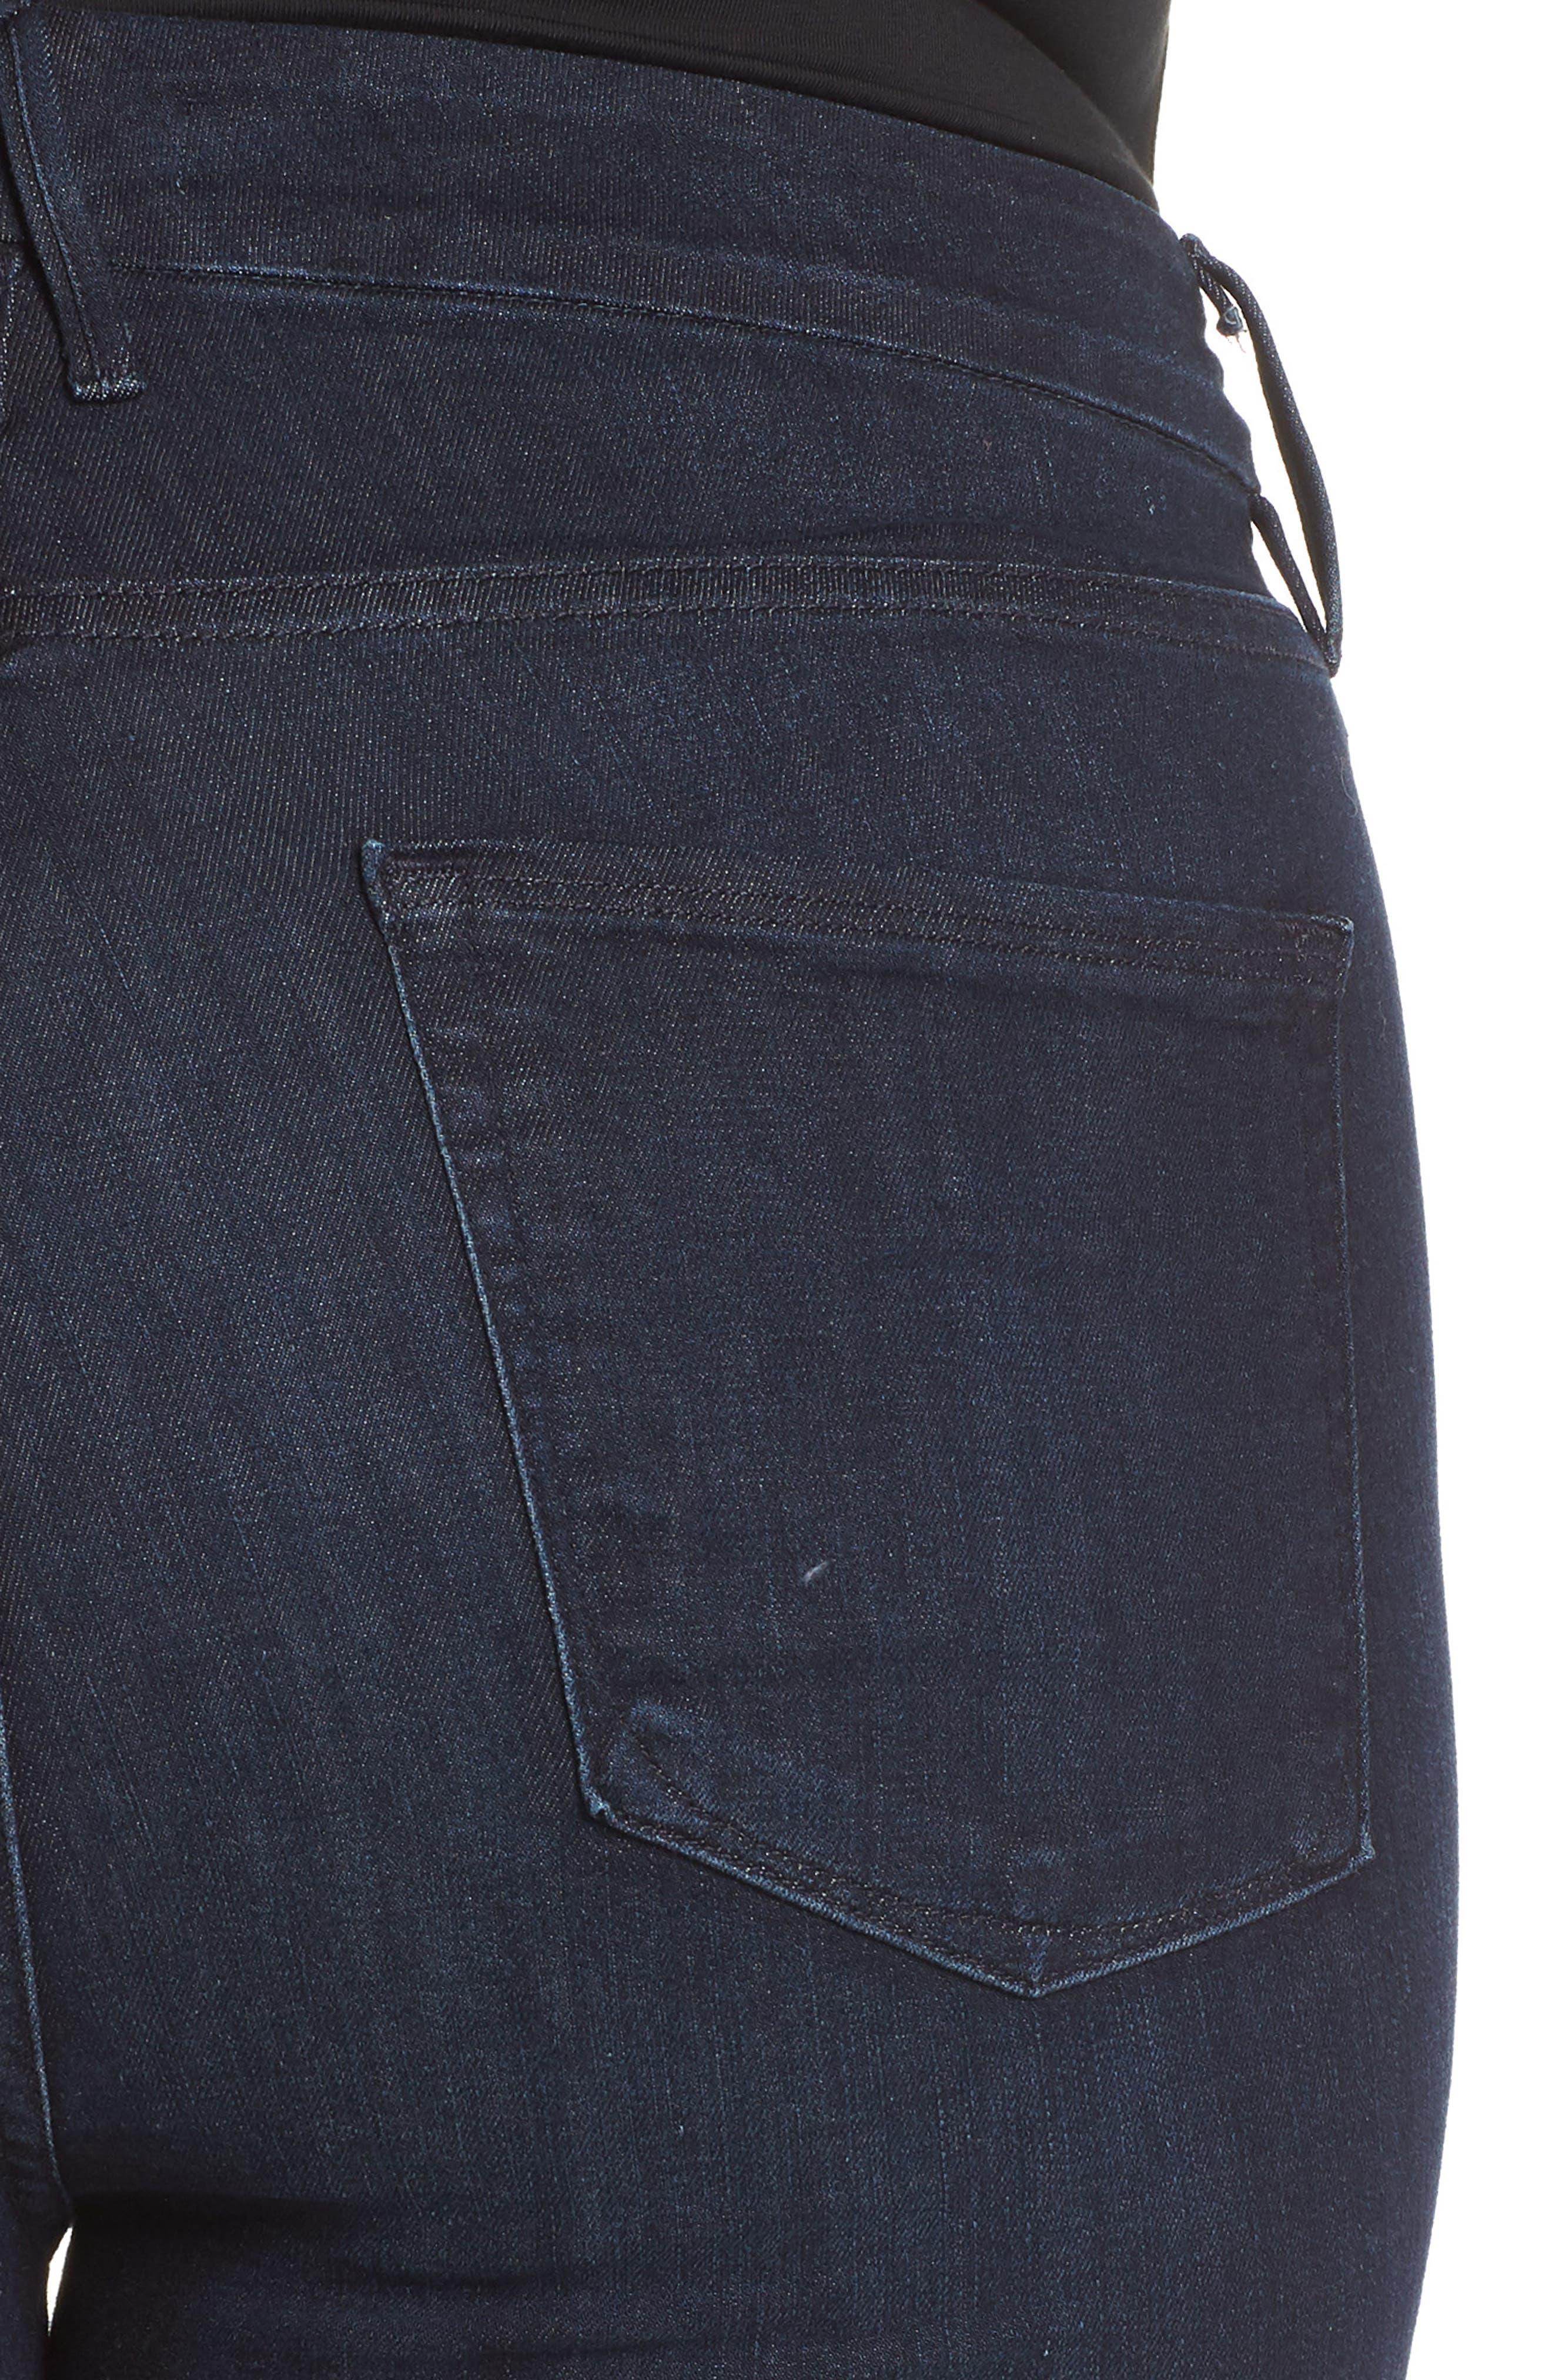 GOOD AMERICAN,                             Good Legs High Waist Skinny Jeans,                             Alternate thumbnail 11, color,                             BLUE224